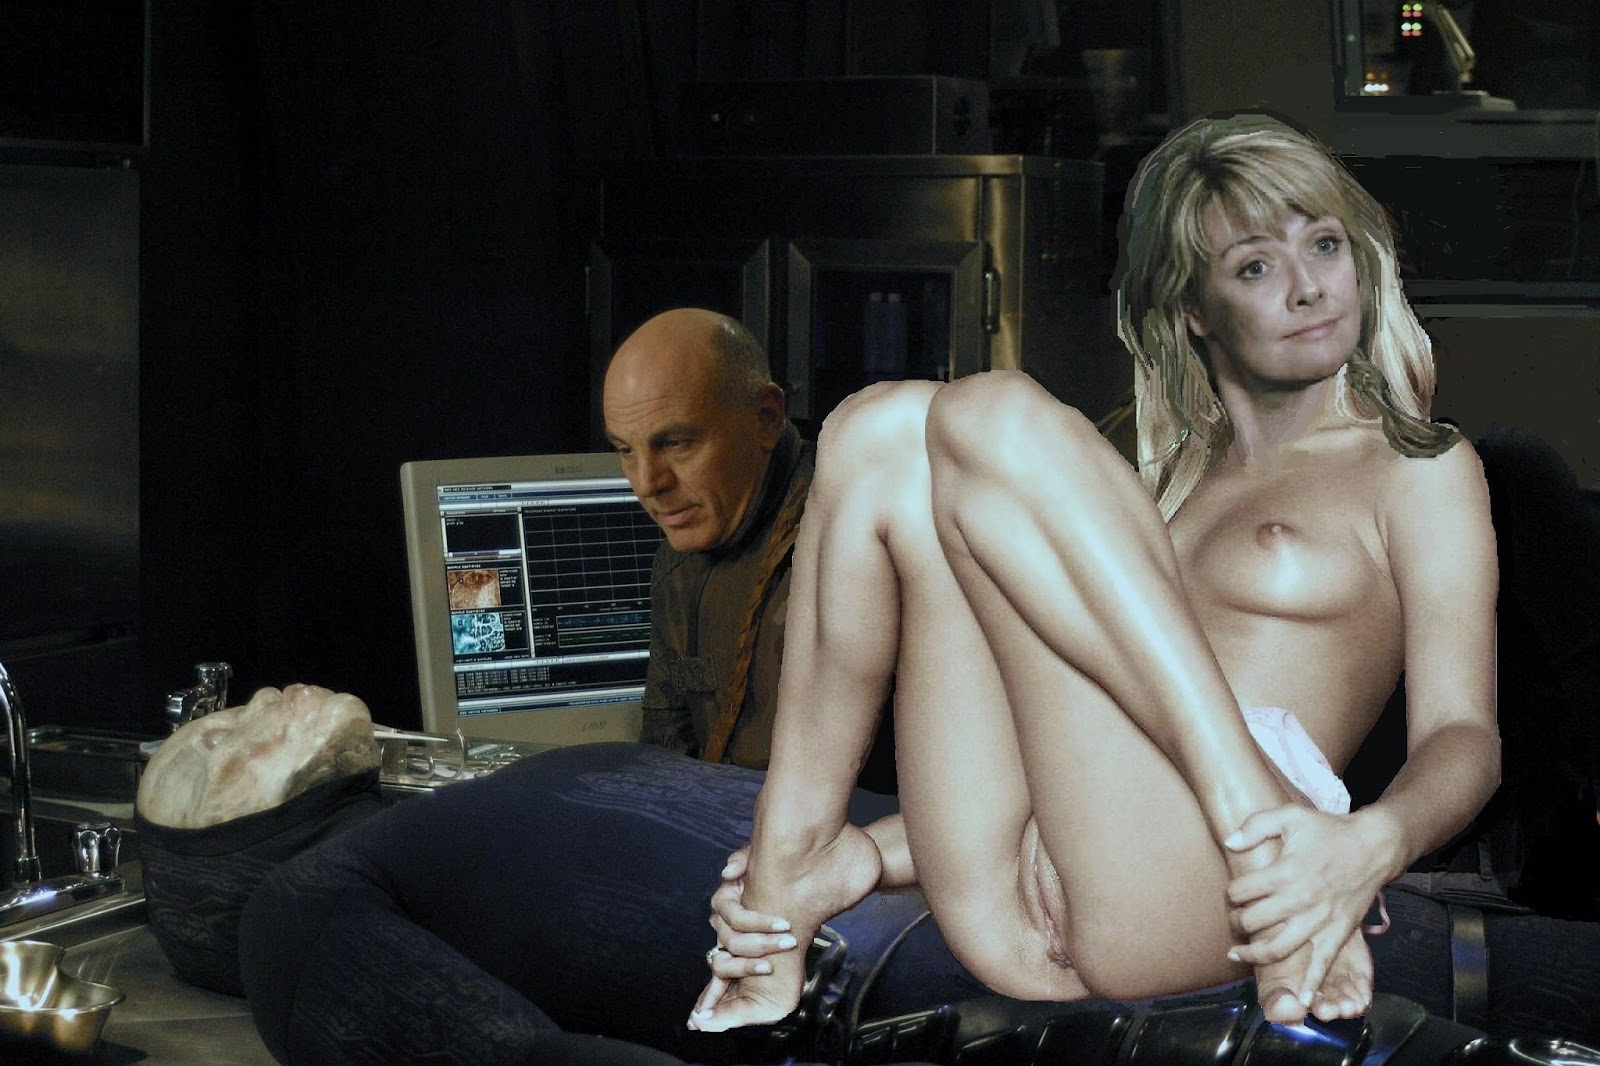 Amanda Tapping Boobs amanda tapping nude fakes hot girls wallpaper - girls